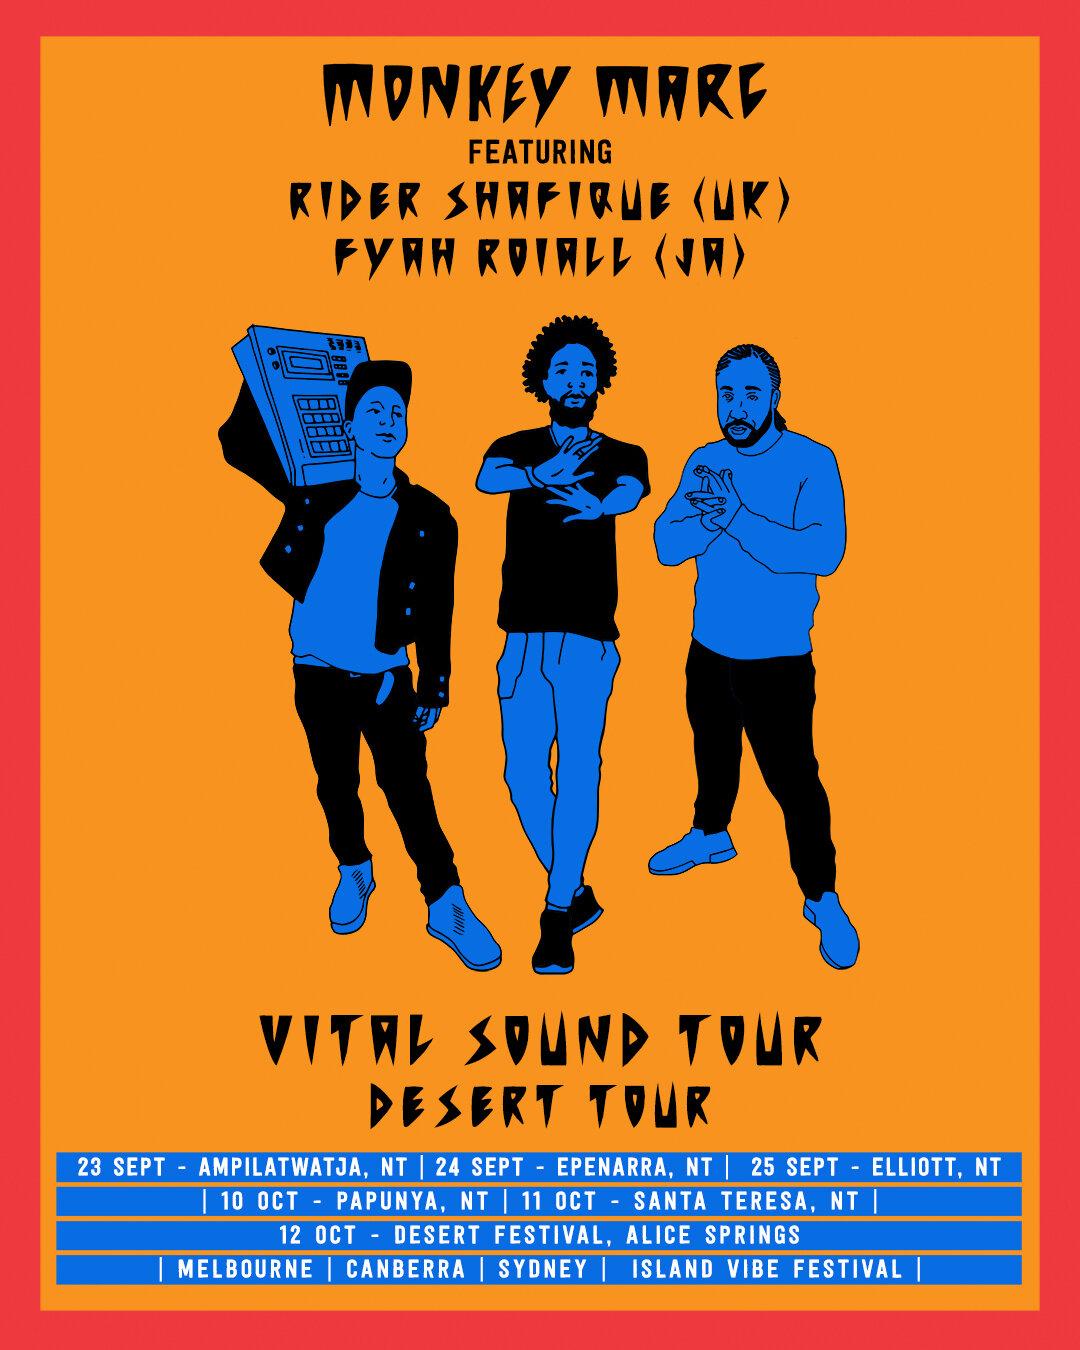 Vital Sound Tour - Monkey Marc feat Rider Shafique & Fyah Roiall